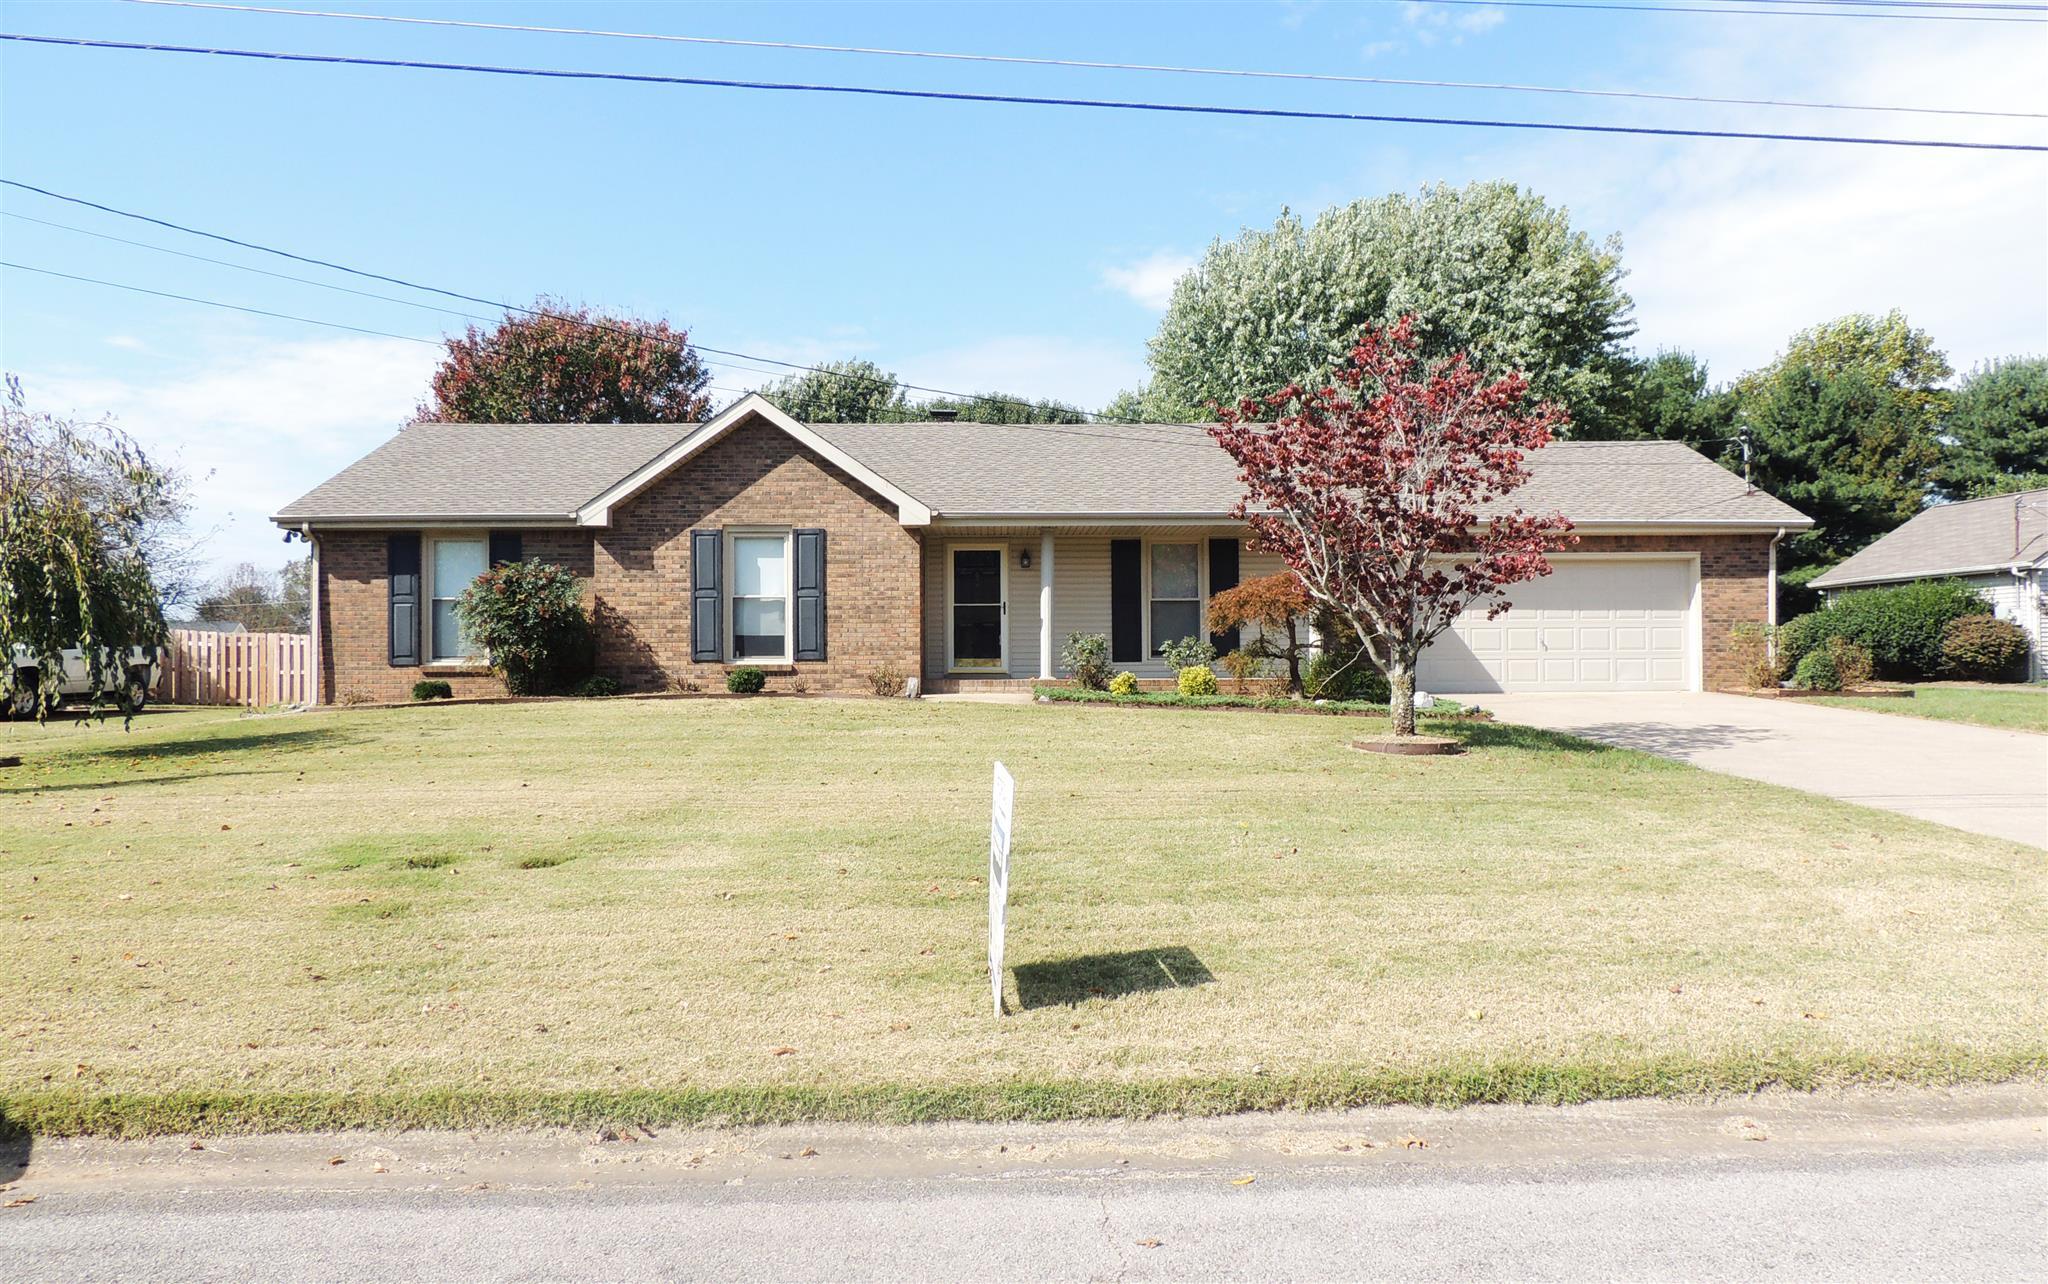 520 Windsor Dr, Clarksville, TN 37043